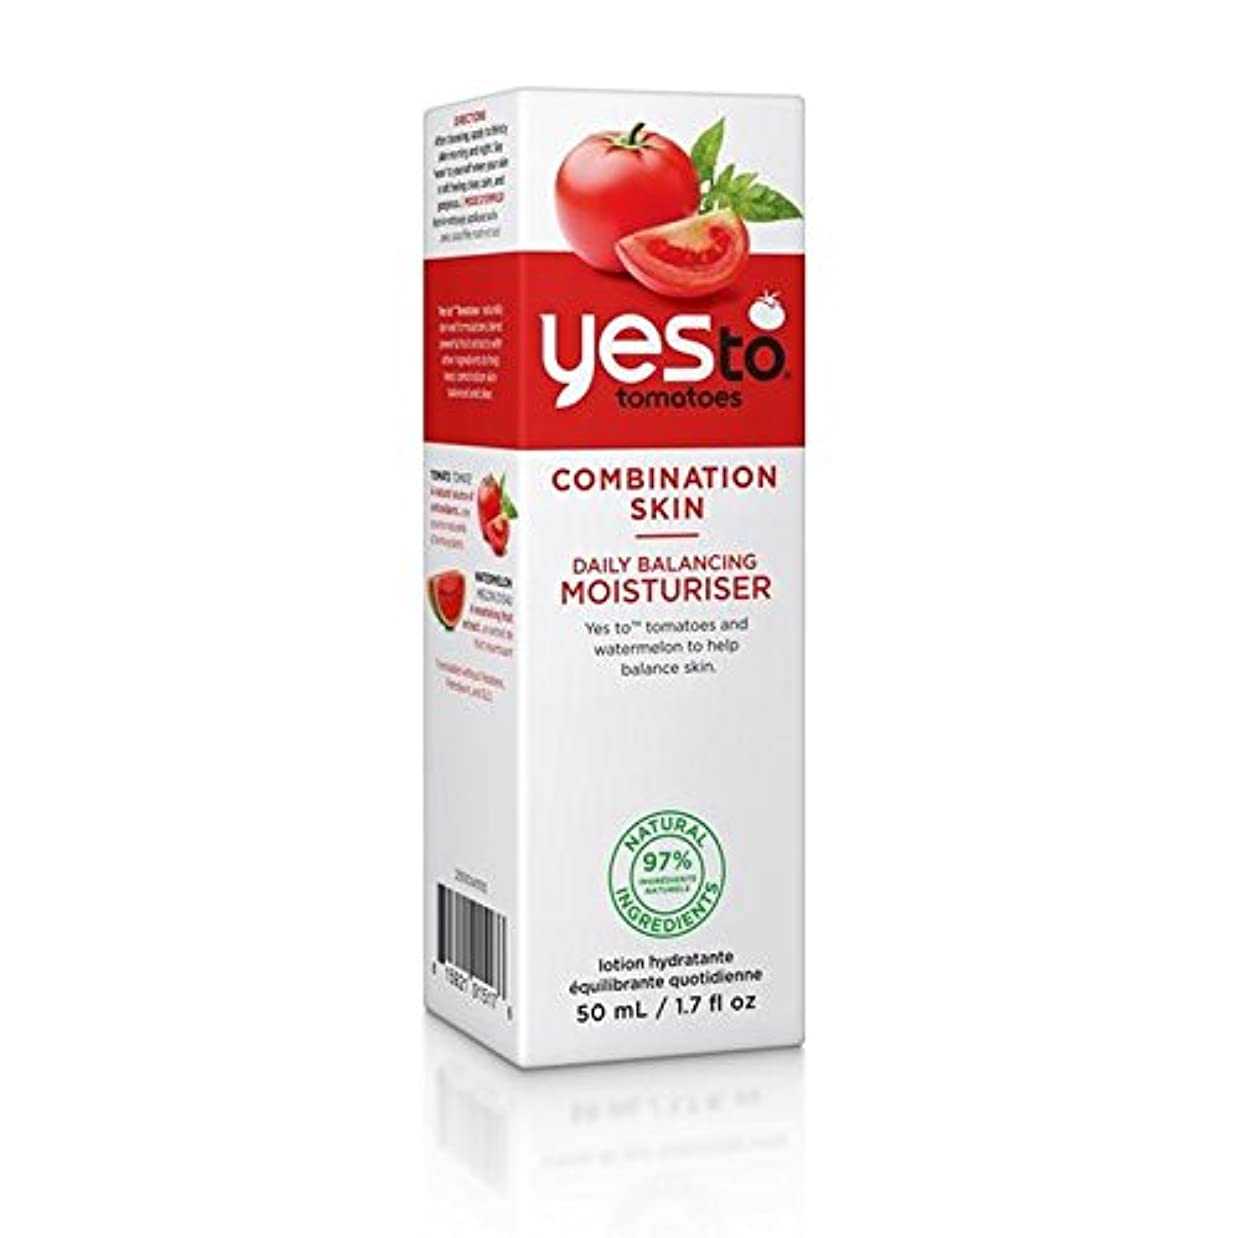 Yes to Tomatoes Moisturiser 50ml - はいトマトに保湿50ミリリットル [並行輸入品]